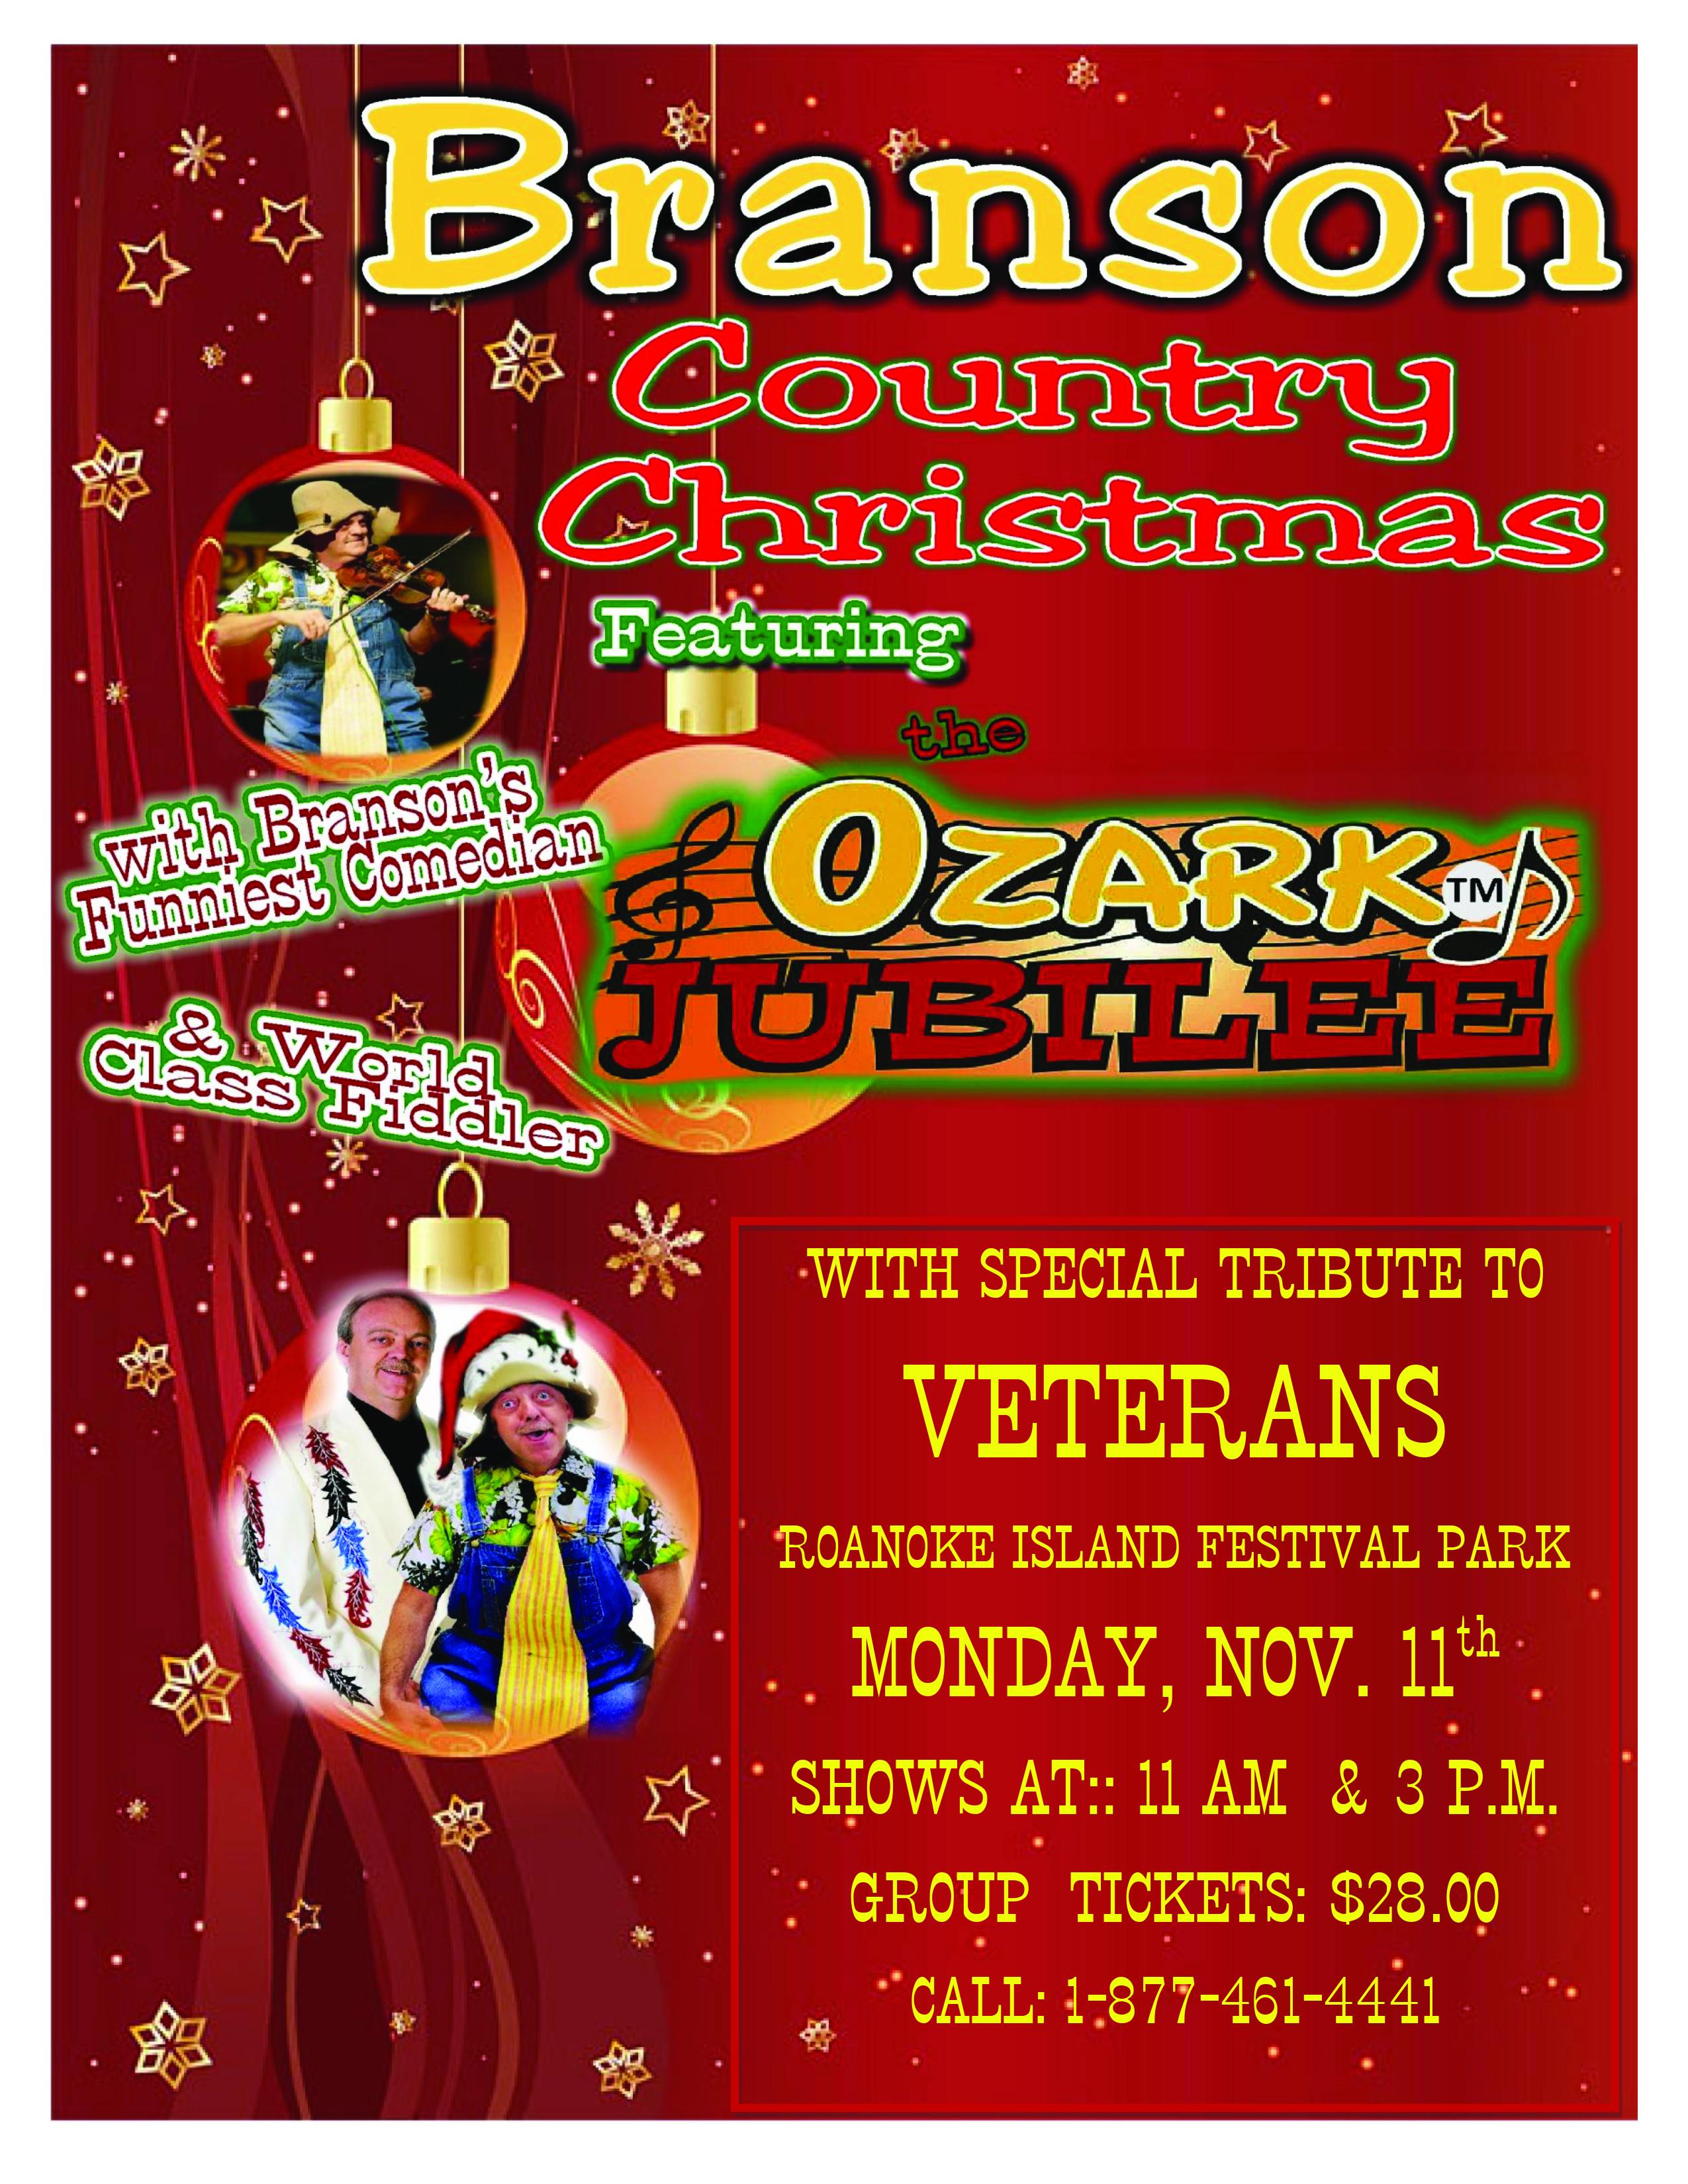 Christmas Jubilee 2019 Roanoke Island: Branson Country Christmas and Veterans Show